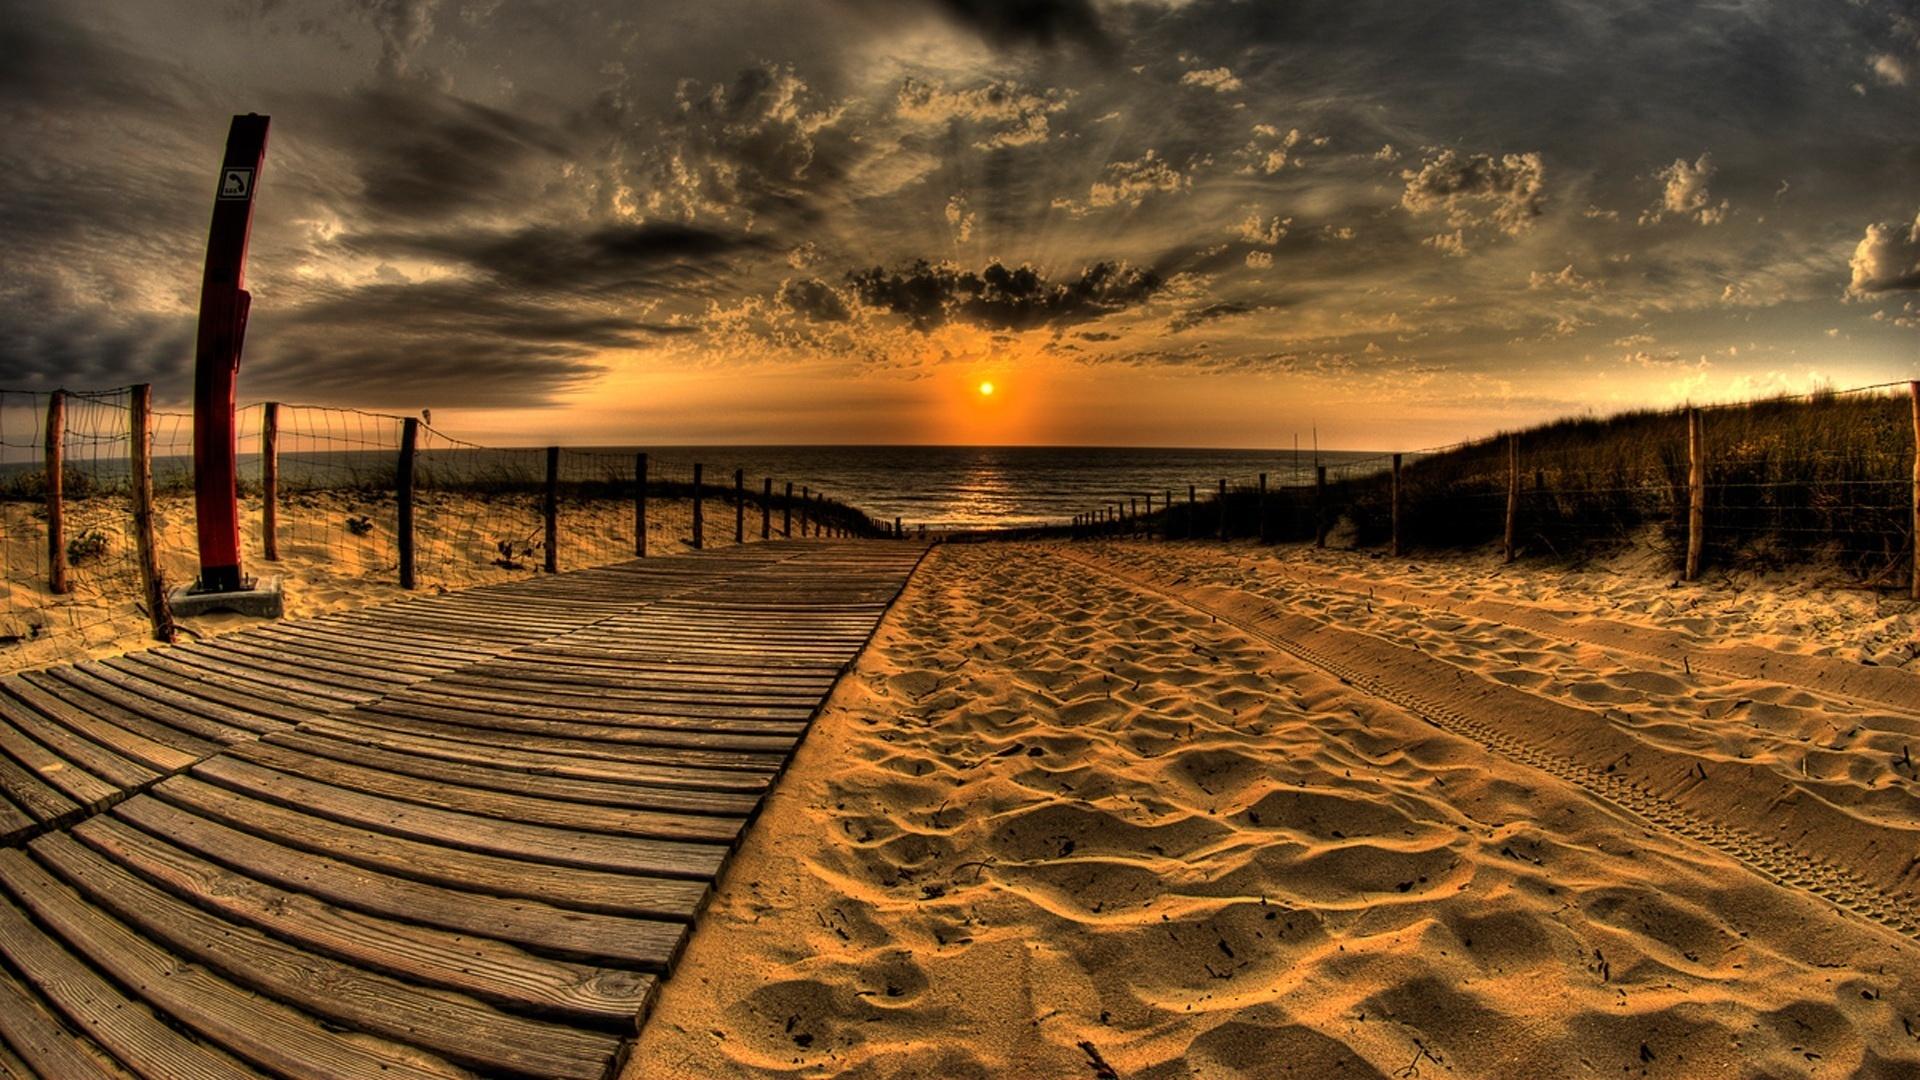 Beautiful Sunset Wallpaper HD 1920x1080 ImageBankbiz 1920x1080